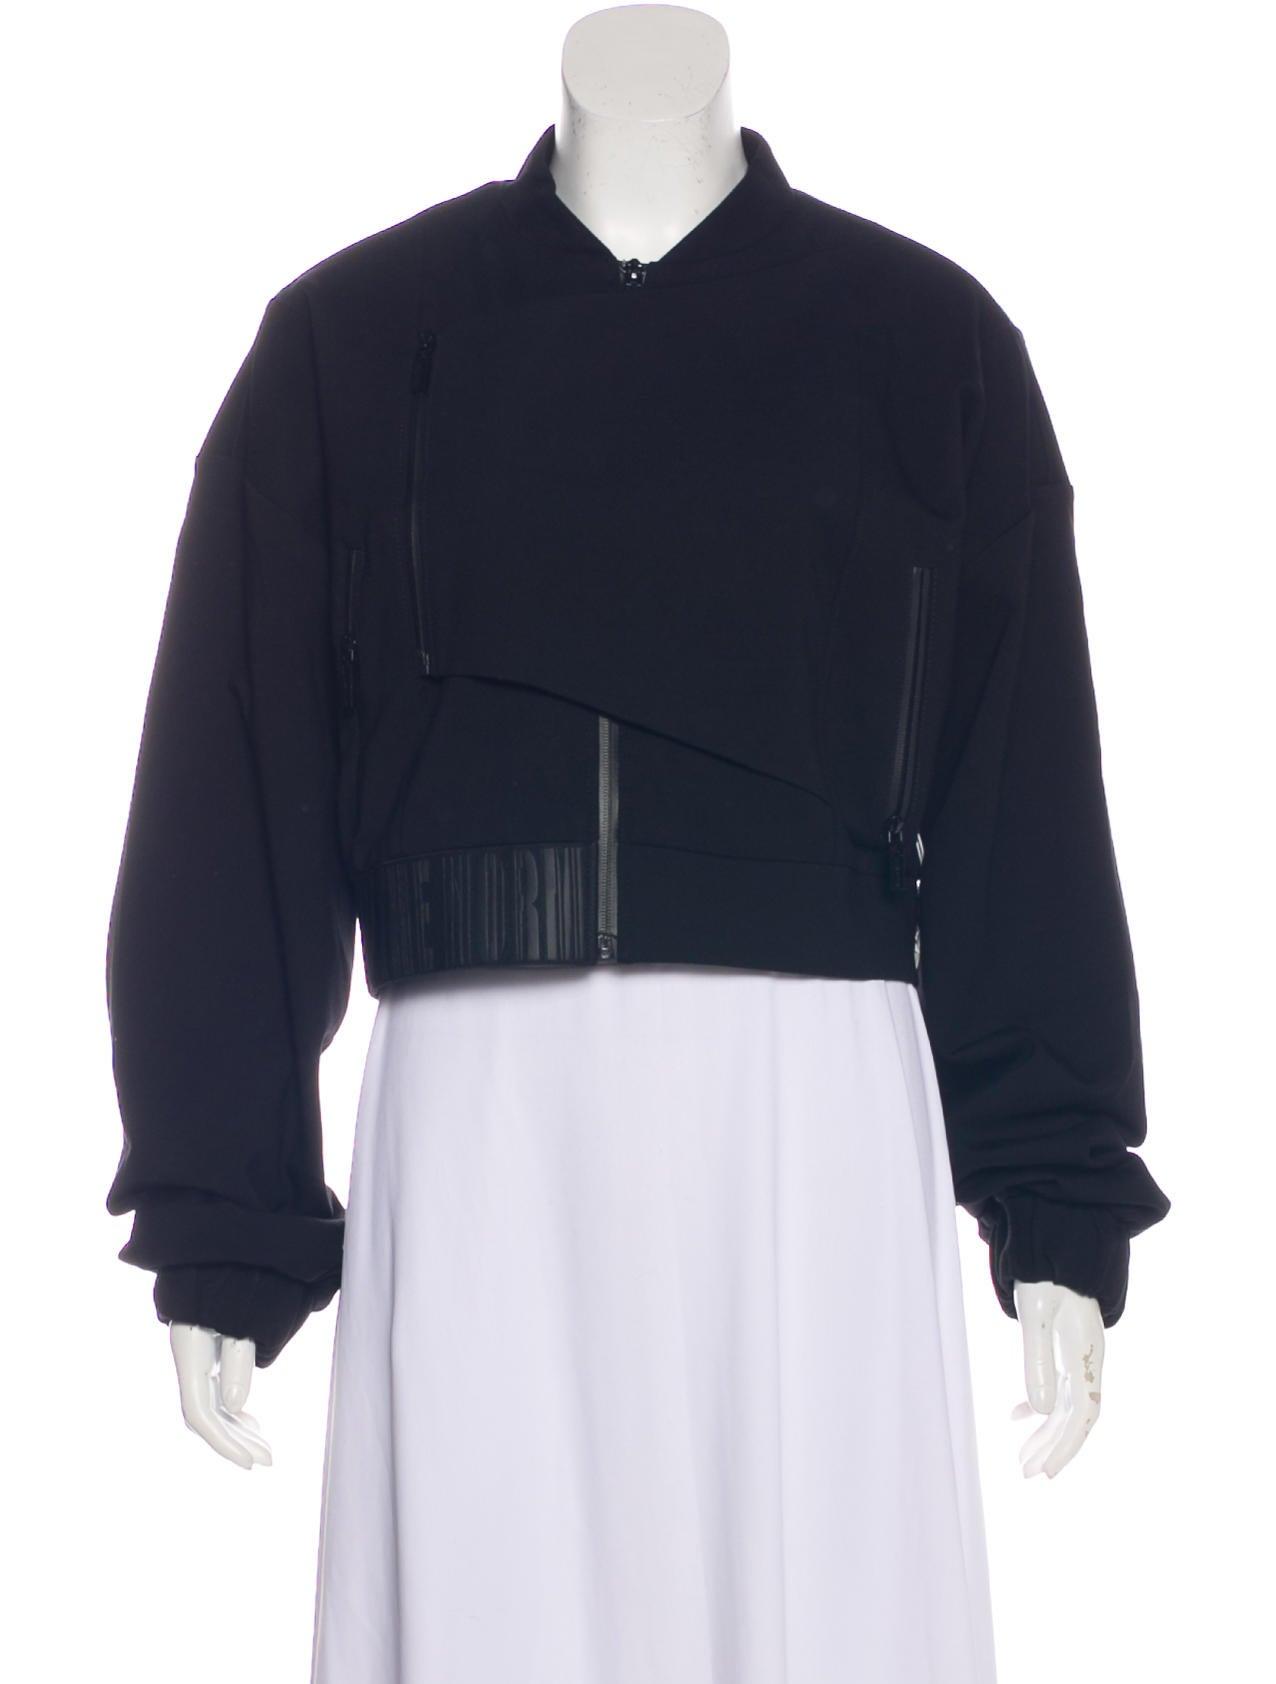 Audience Cropped Zip Up Sweatshirt W Tags Clothing Waudi20007